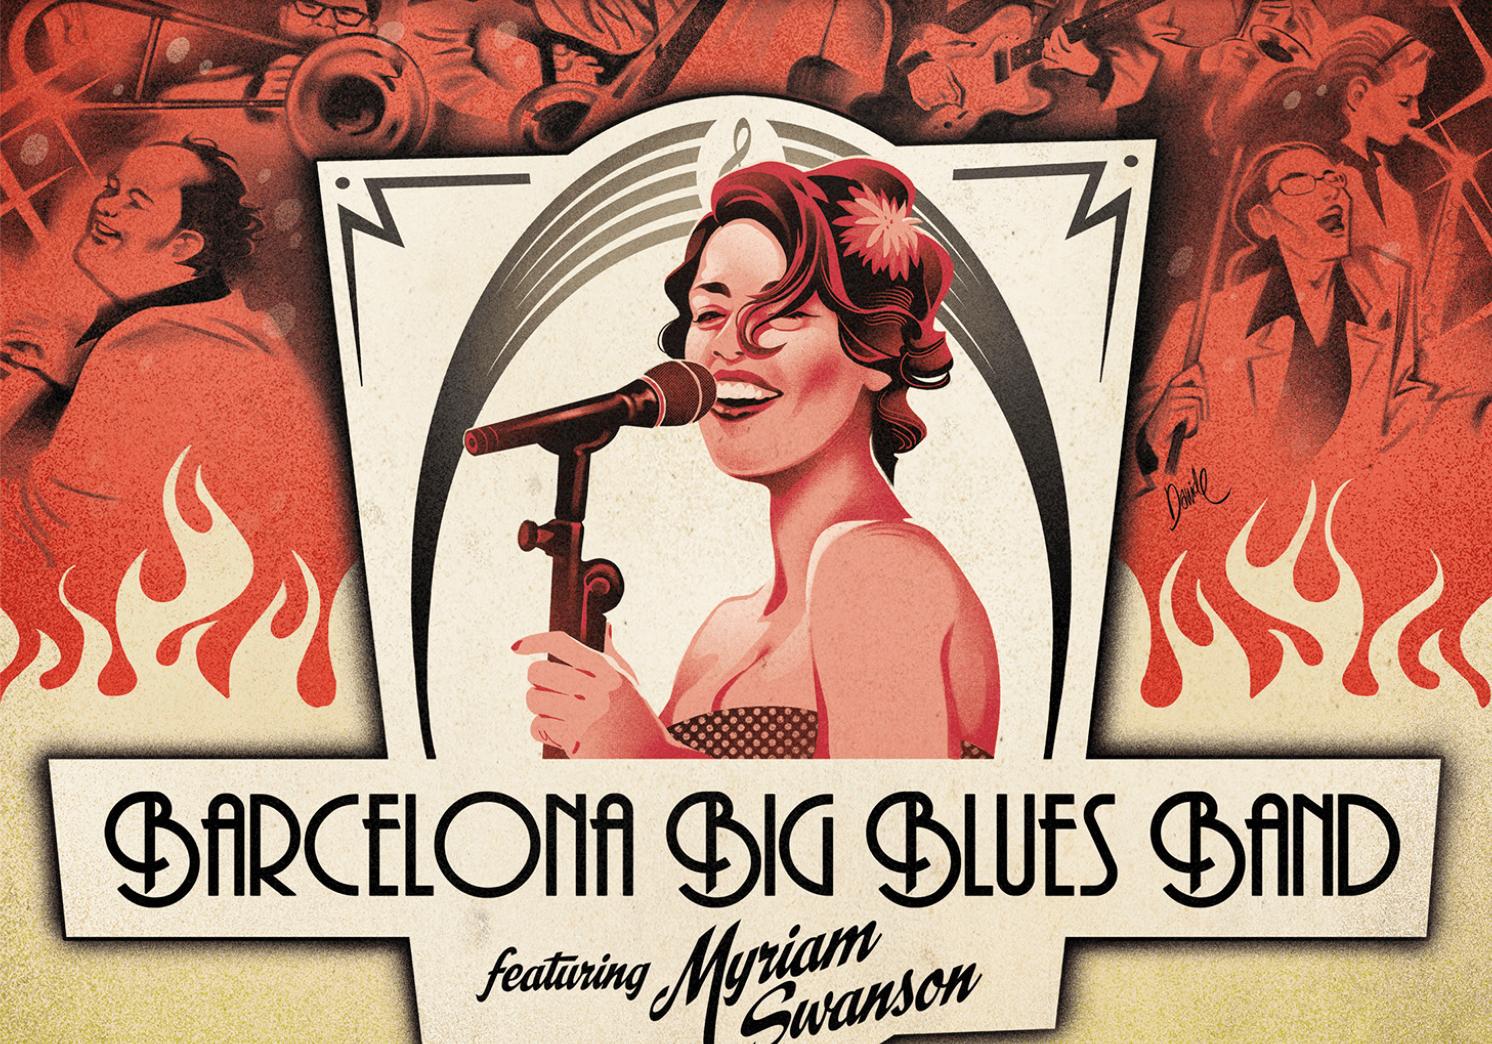 Barcelona big blues band.jpg